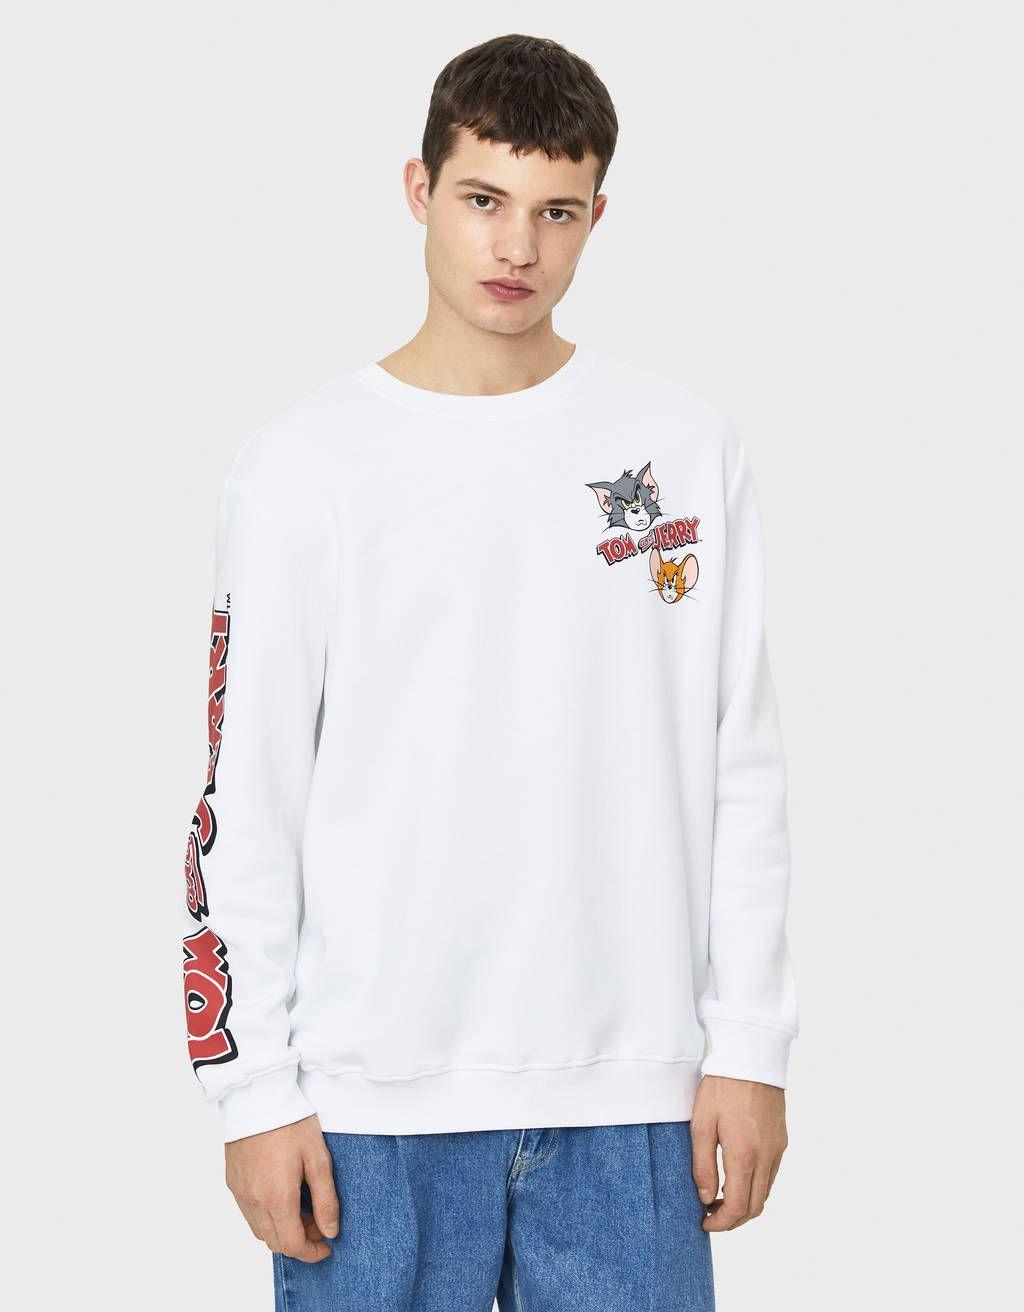 Bershka Tom And Jerry Bershka Bershkacollection Tomandjerry Cartoon Licencia Brand New In Newin Tre Long Sleeve Tshirt Men Mens Sweatshirts Fashion [ 1312 x 1024 Pixel ]